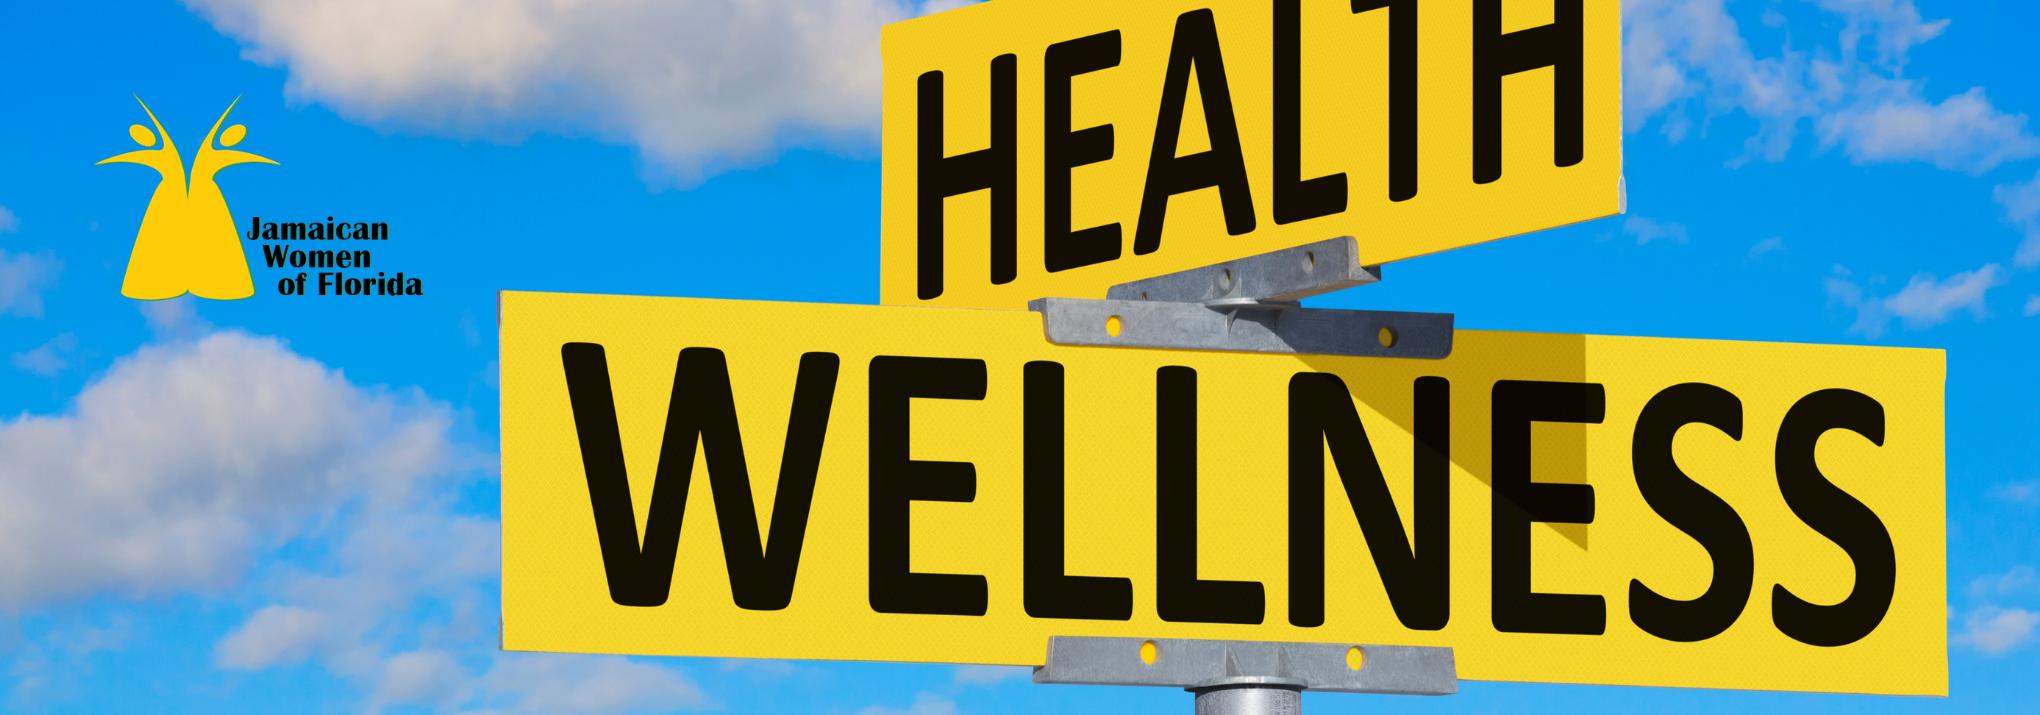 JWOF Hosts Annual Health & Wellness Forum,  Saturday, September 19